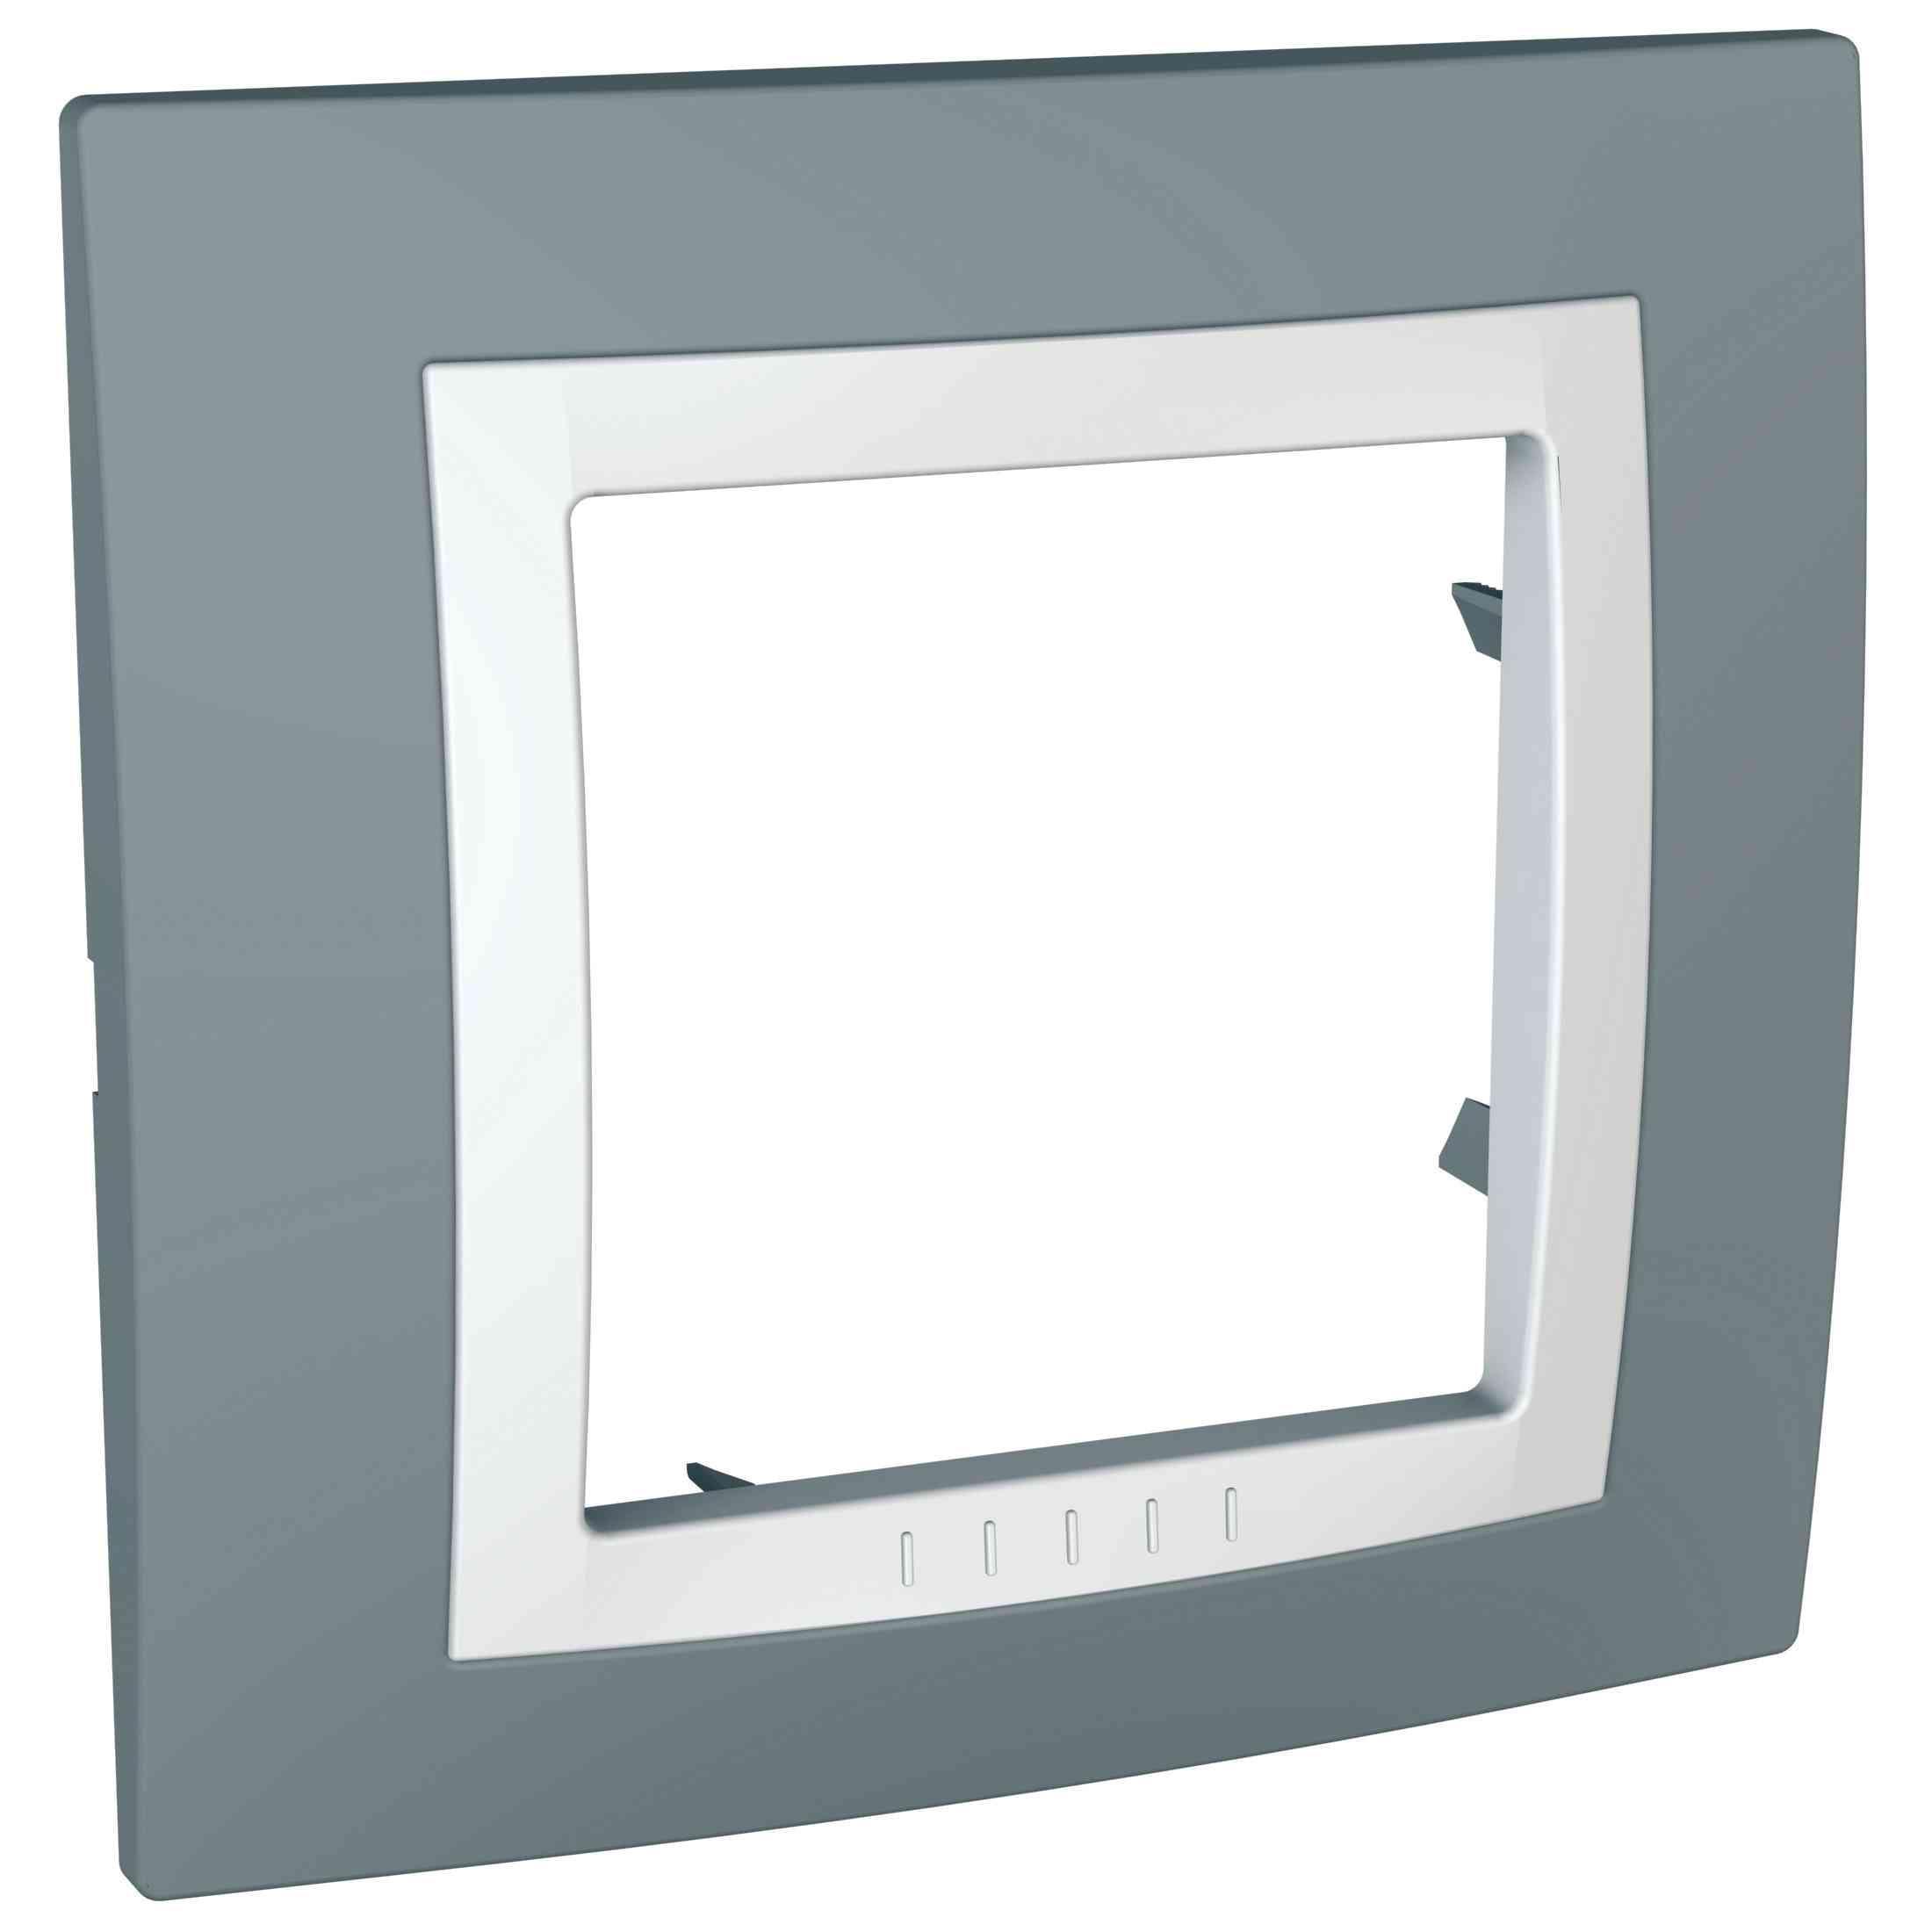 Unica Basic - dekorativni okvir - 1 odprtina - siv/bel